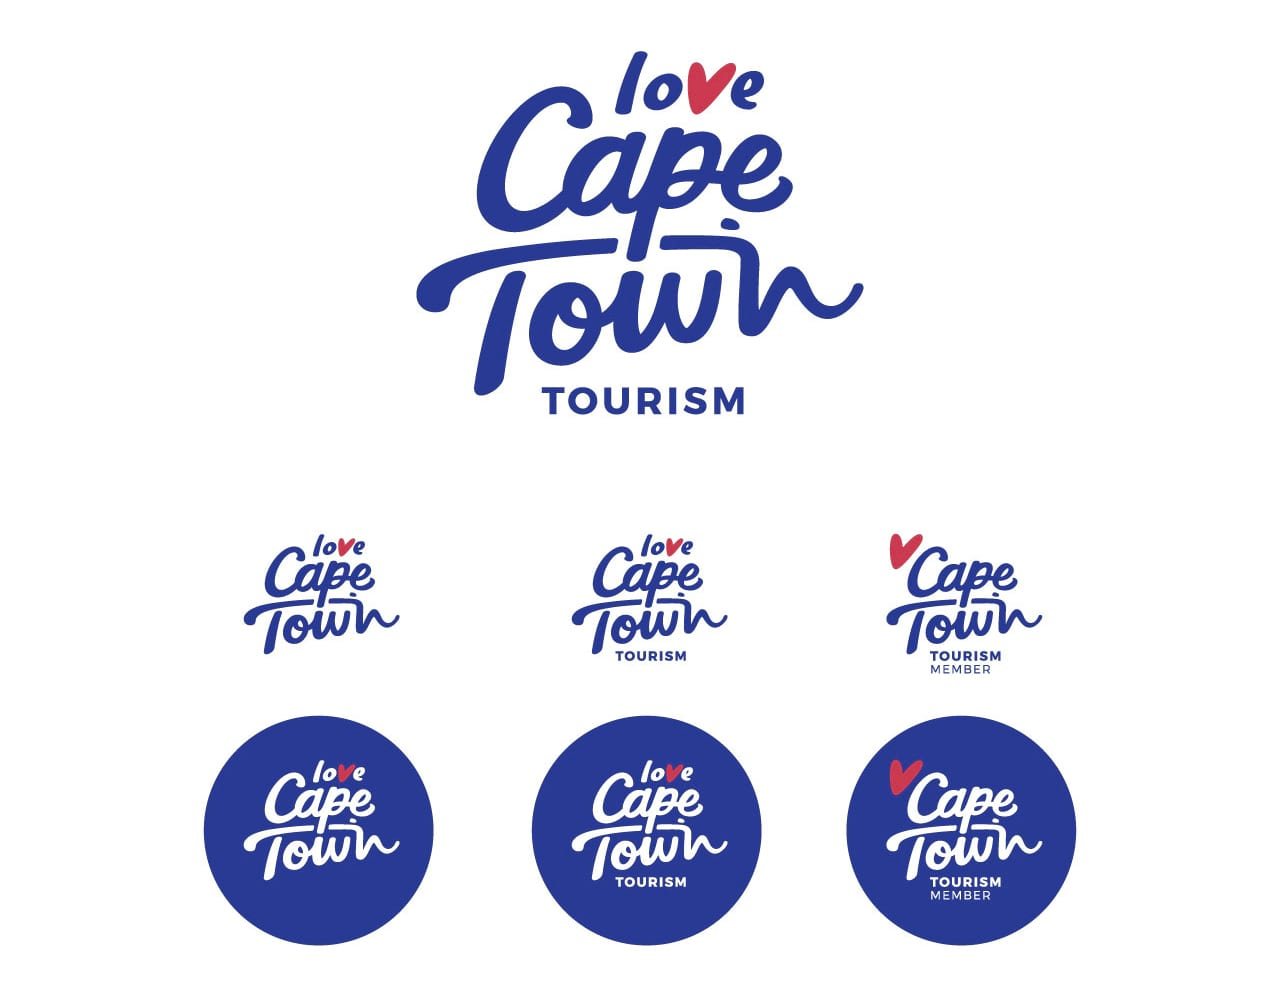 Cape Town Tourism brand Case study logos